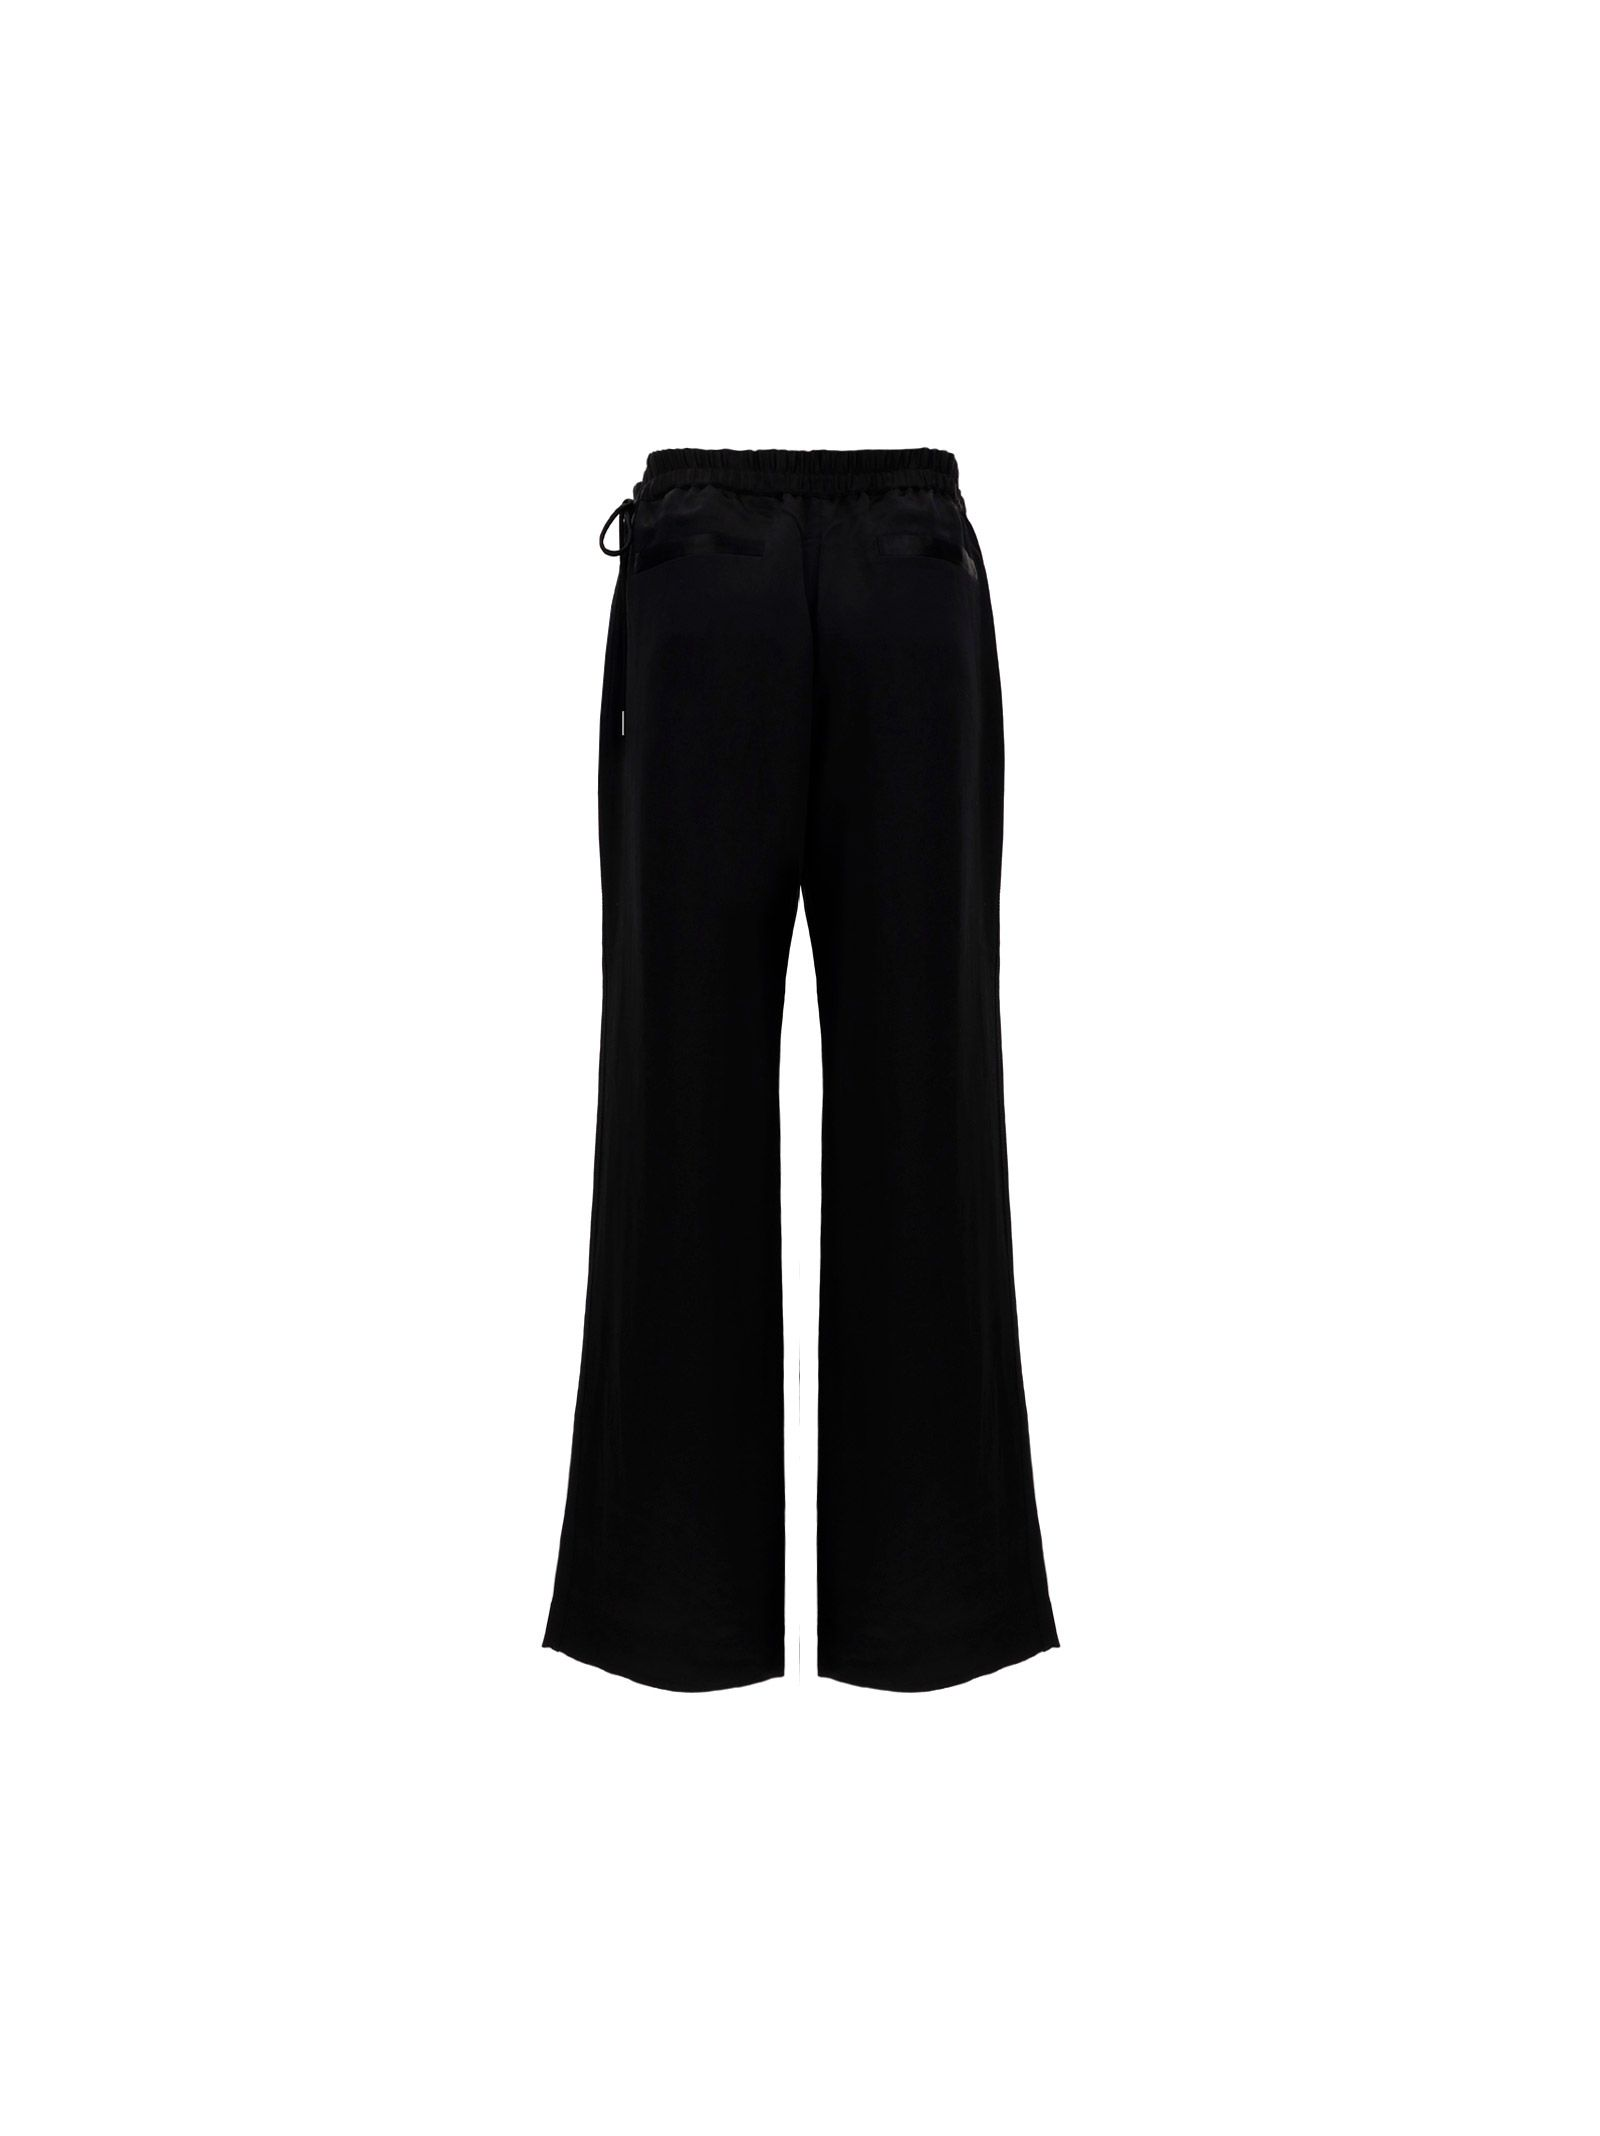 ACNE STUDIOS Cropped pants ACNE STUDIOS WOMEN'S BLACK OTHER MATERIALS PANTS